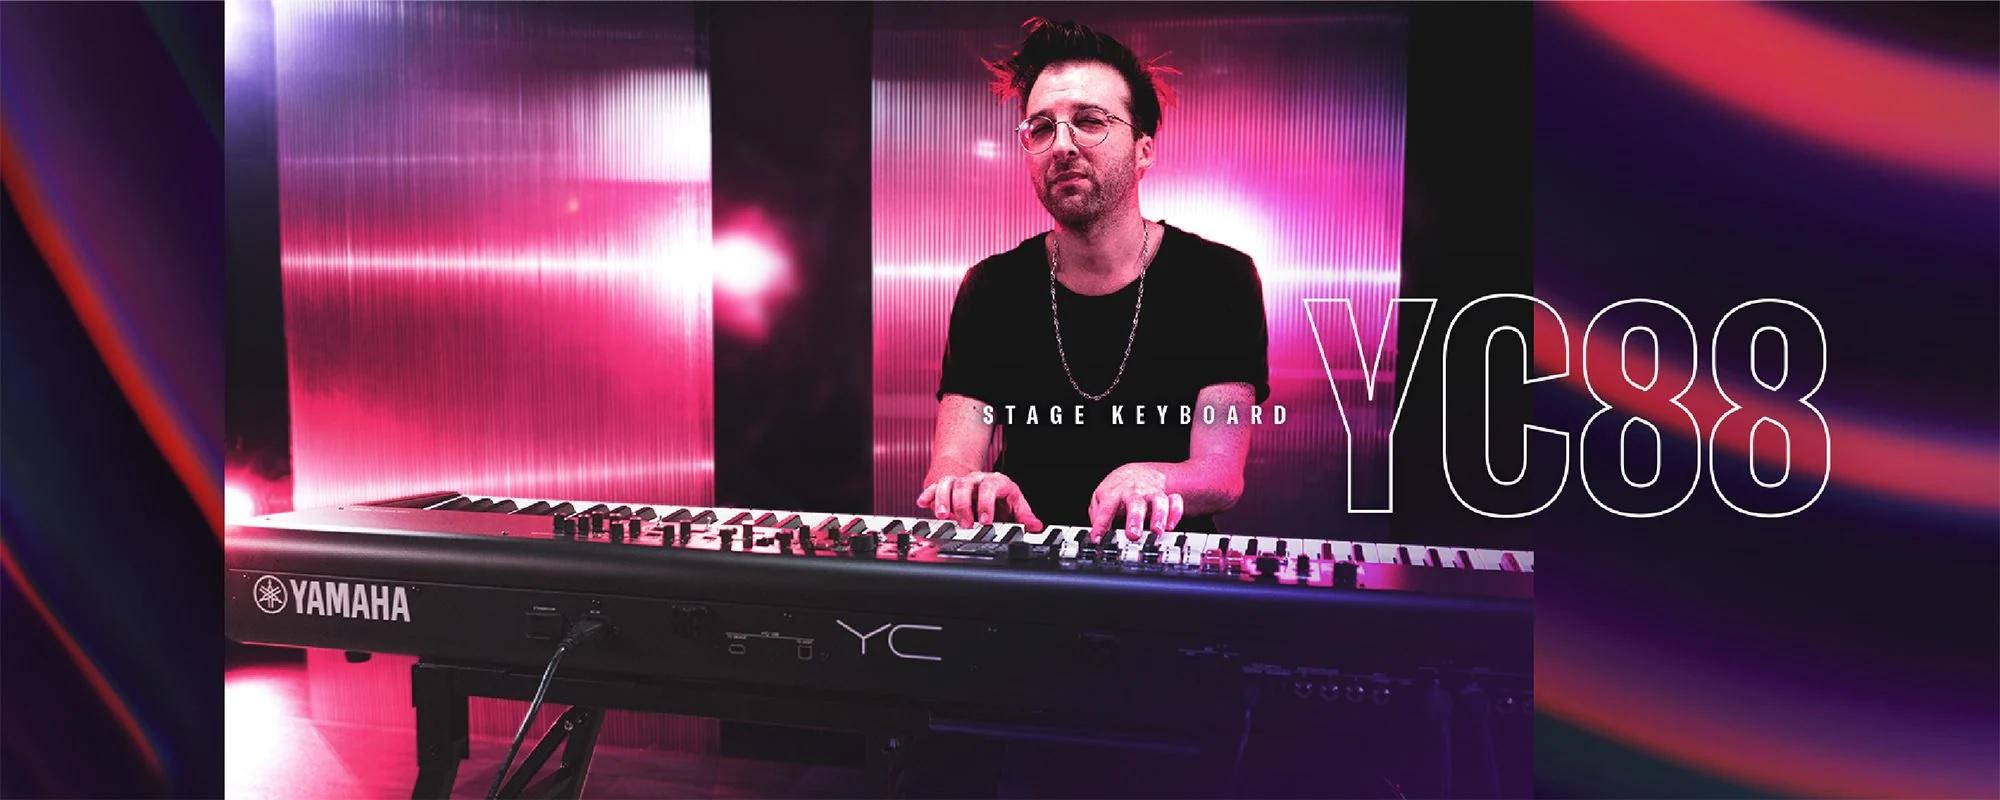 yamaha yc88 with Uri Gincel